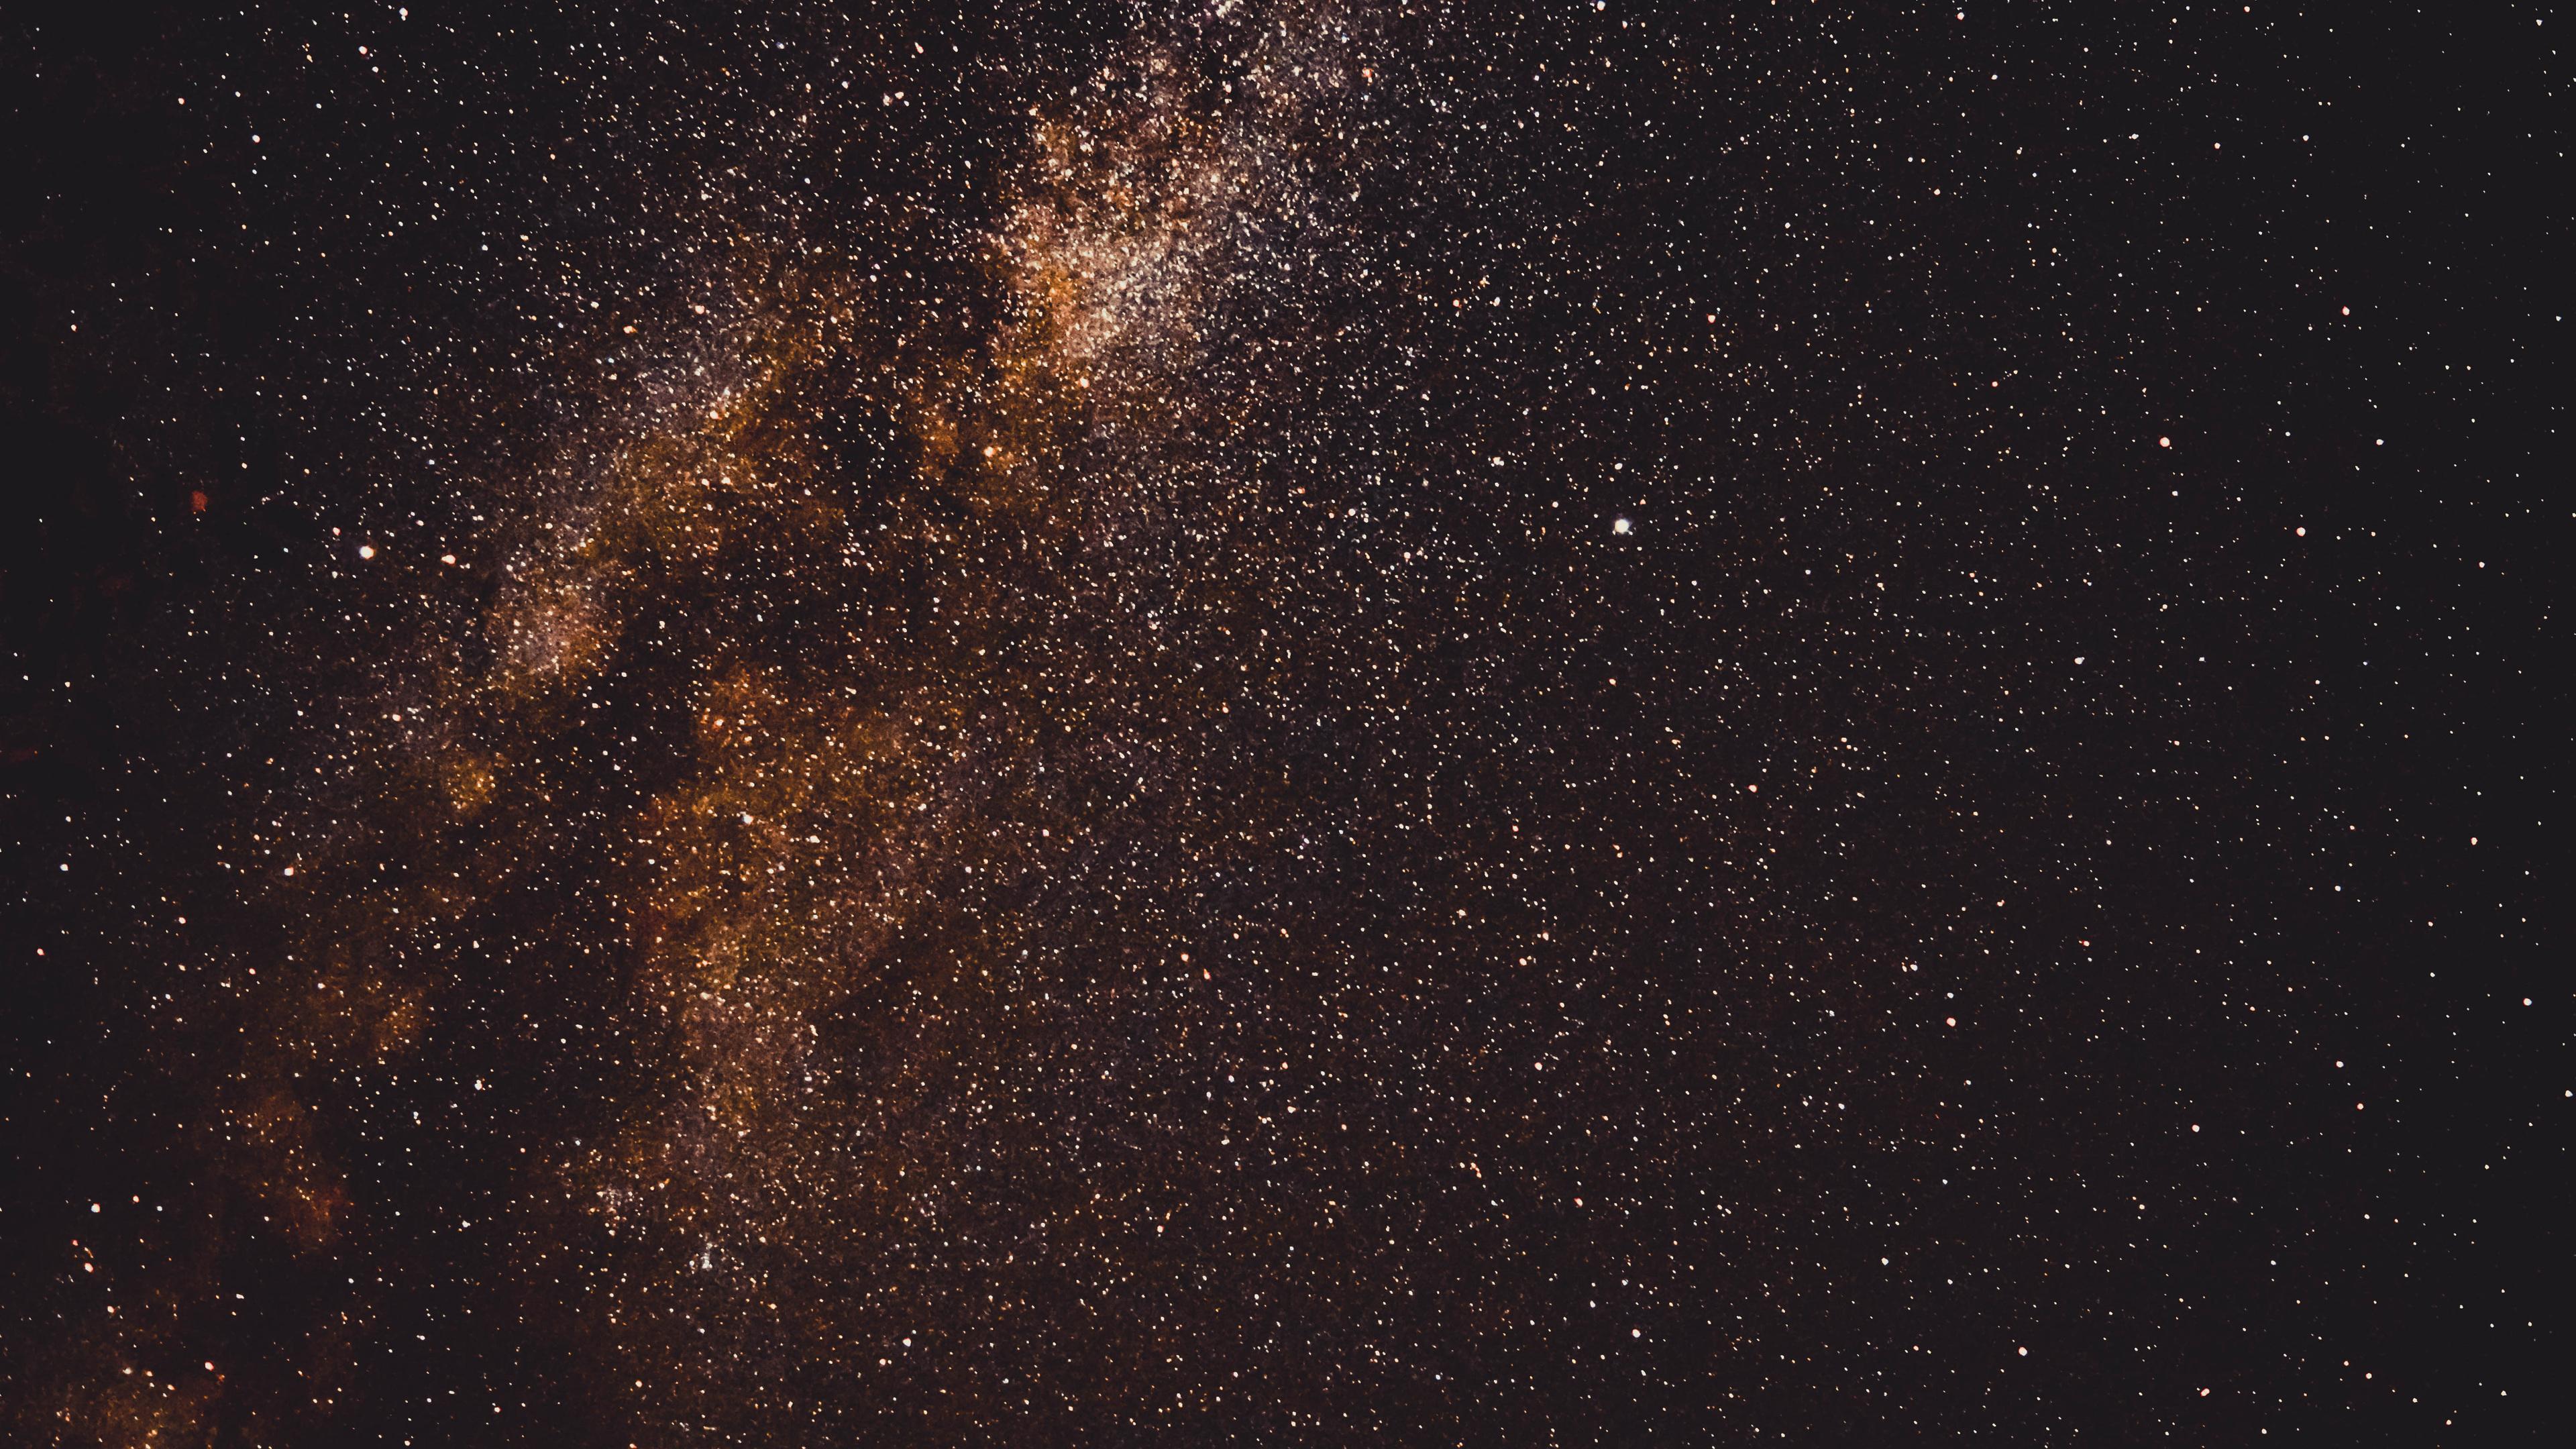 Wallpaper 4k Constellation Milky Way Star Space Sky 4k 4k Wallpapers